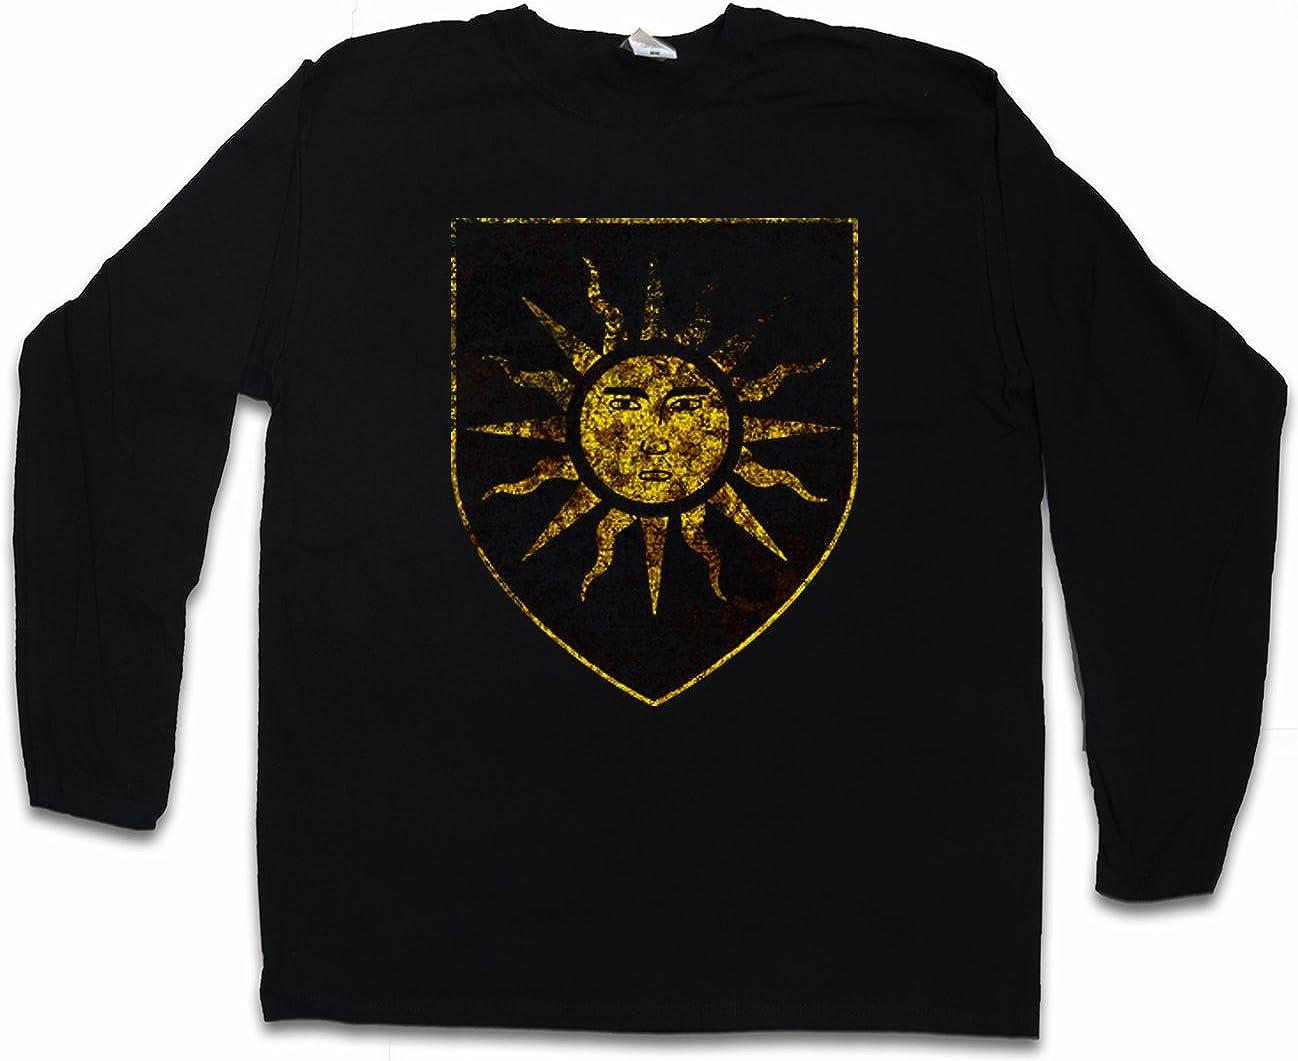 SUN T-SHIRT Sonne Nilfgaard Nilfgaardian Logo Empire Insignia Emperor